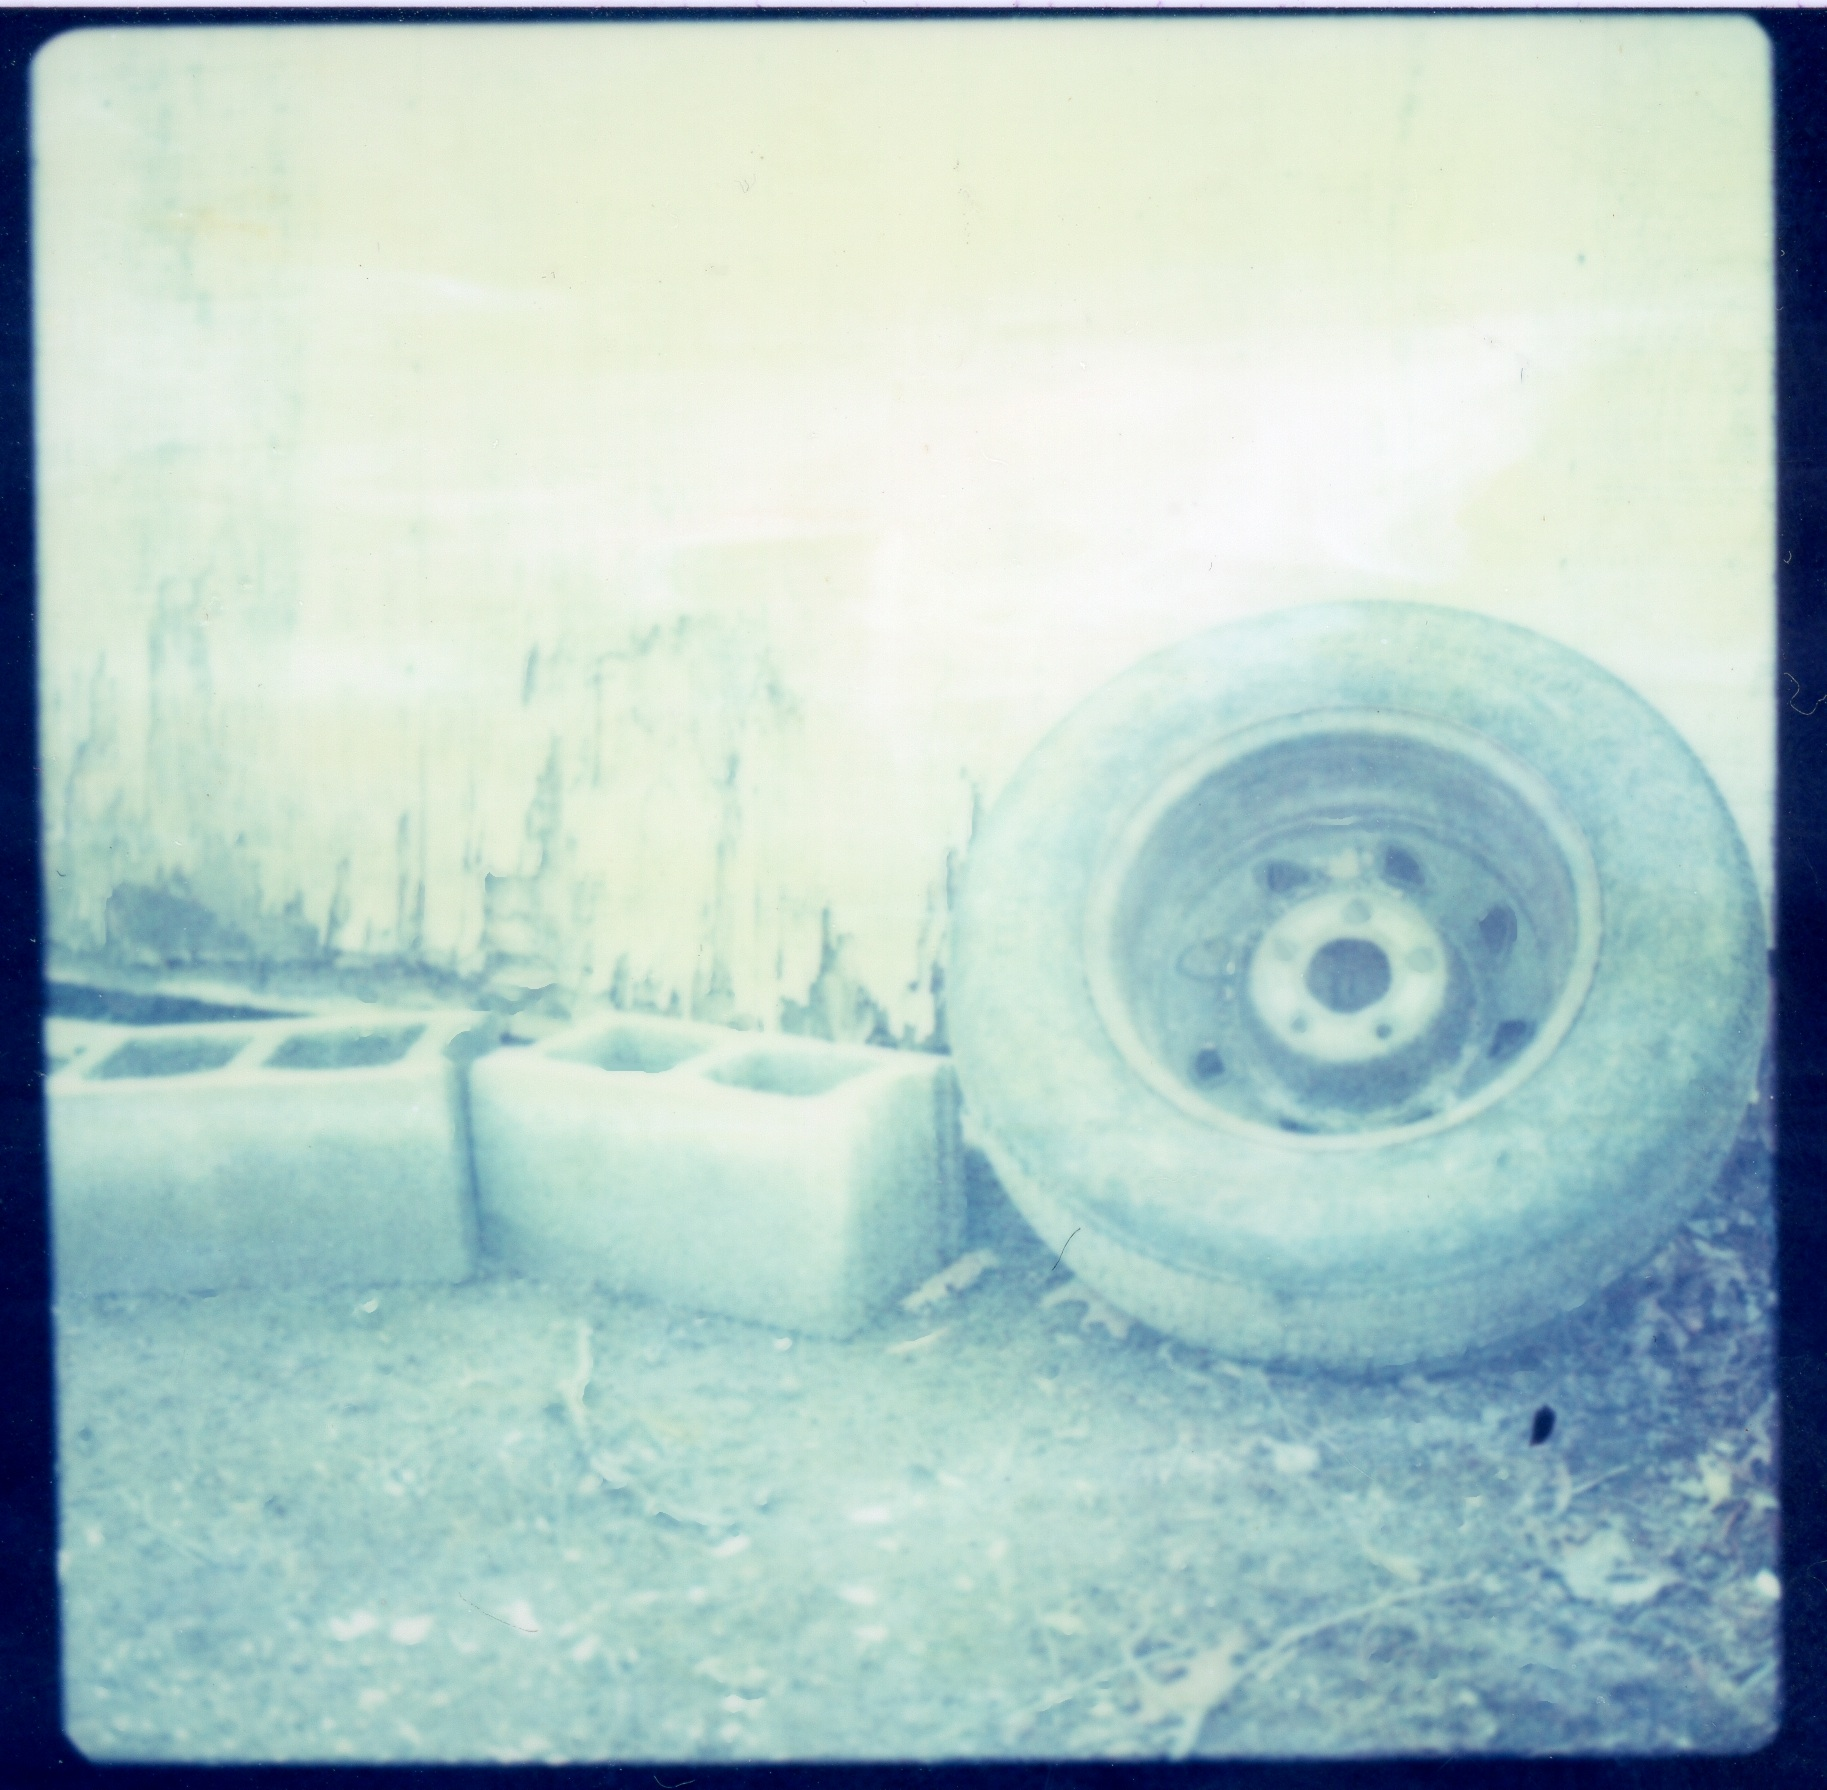 © 2013 Kat Phillips. Hasselblad 500C with Polaroid Polacolor Ultraviolet Film.